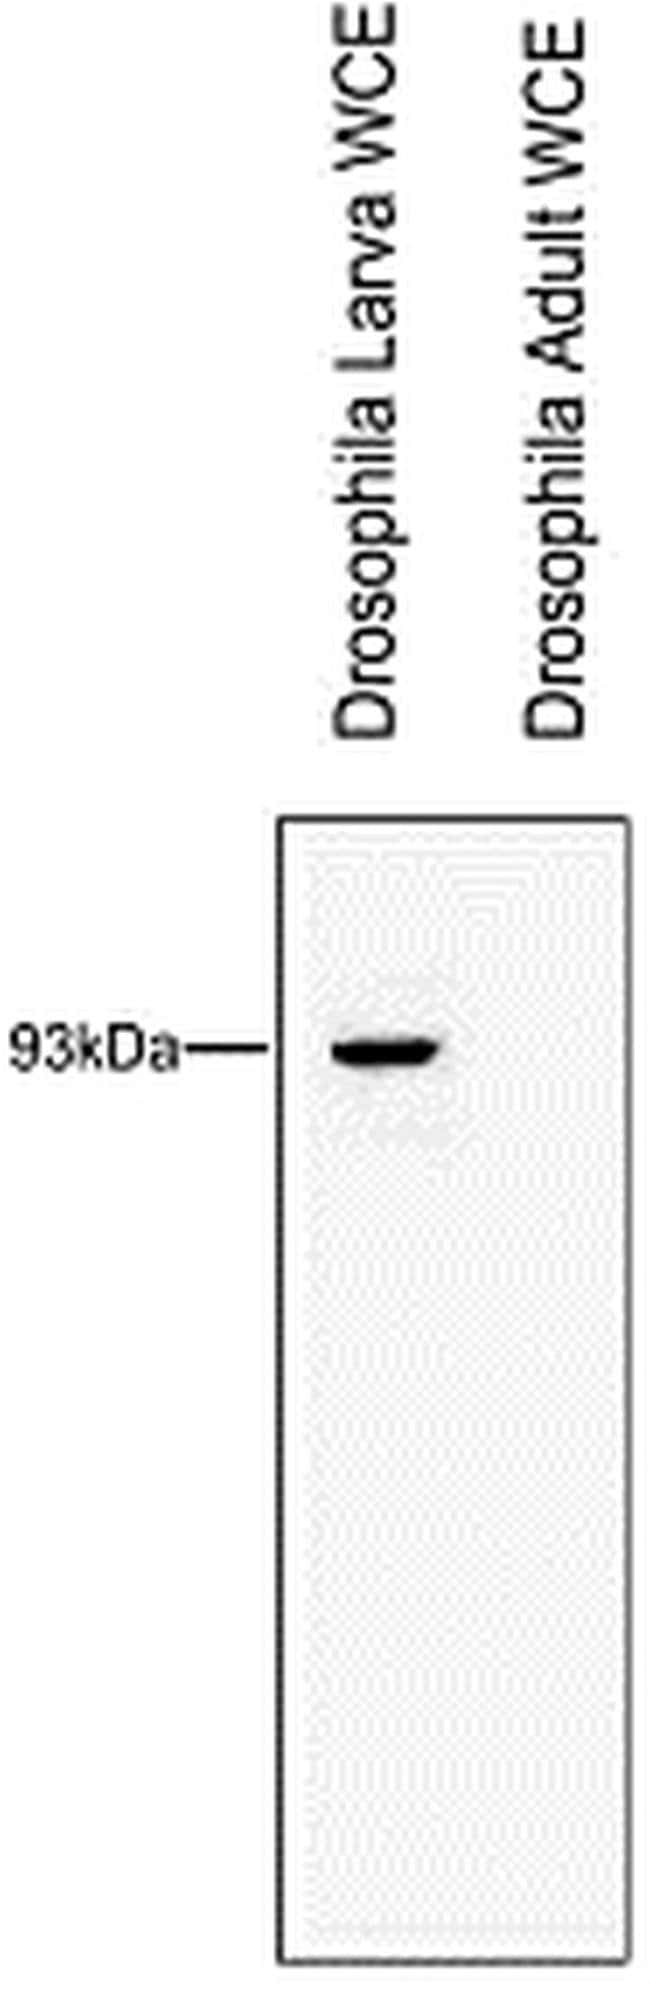 RTF1 Rabbit anti-Drosophila, Polyclonal, Invitrogen 50 µg; Unconjugated